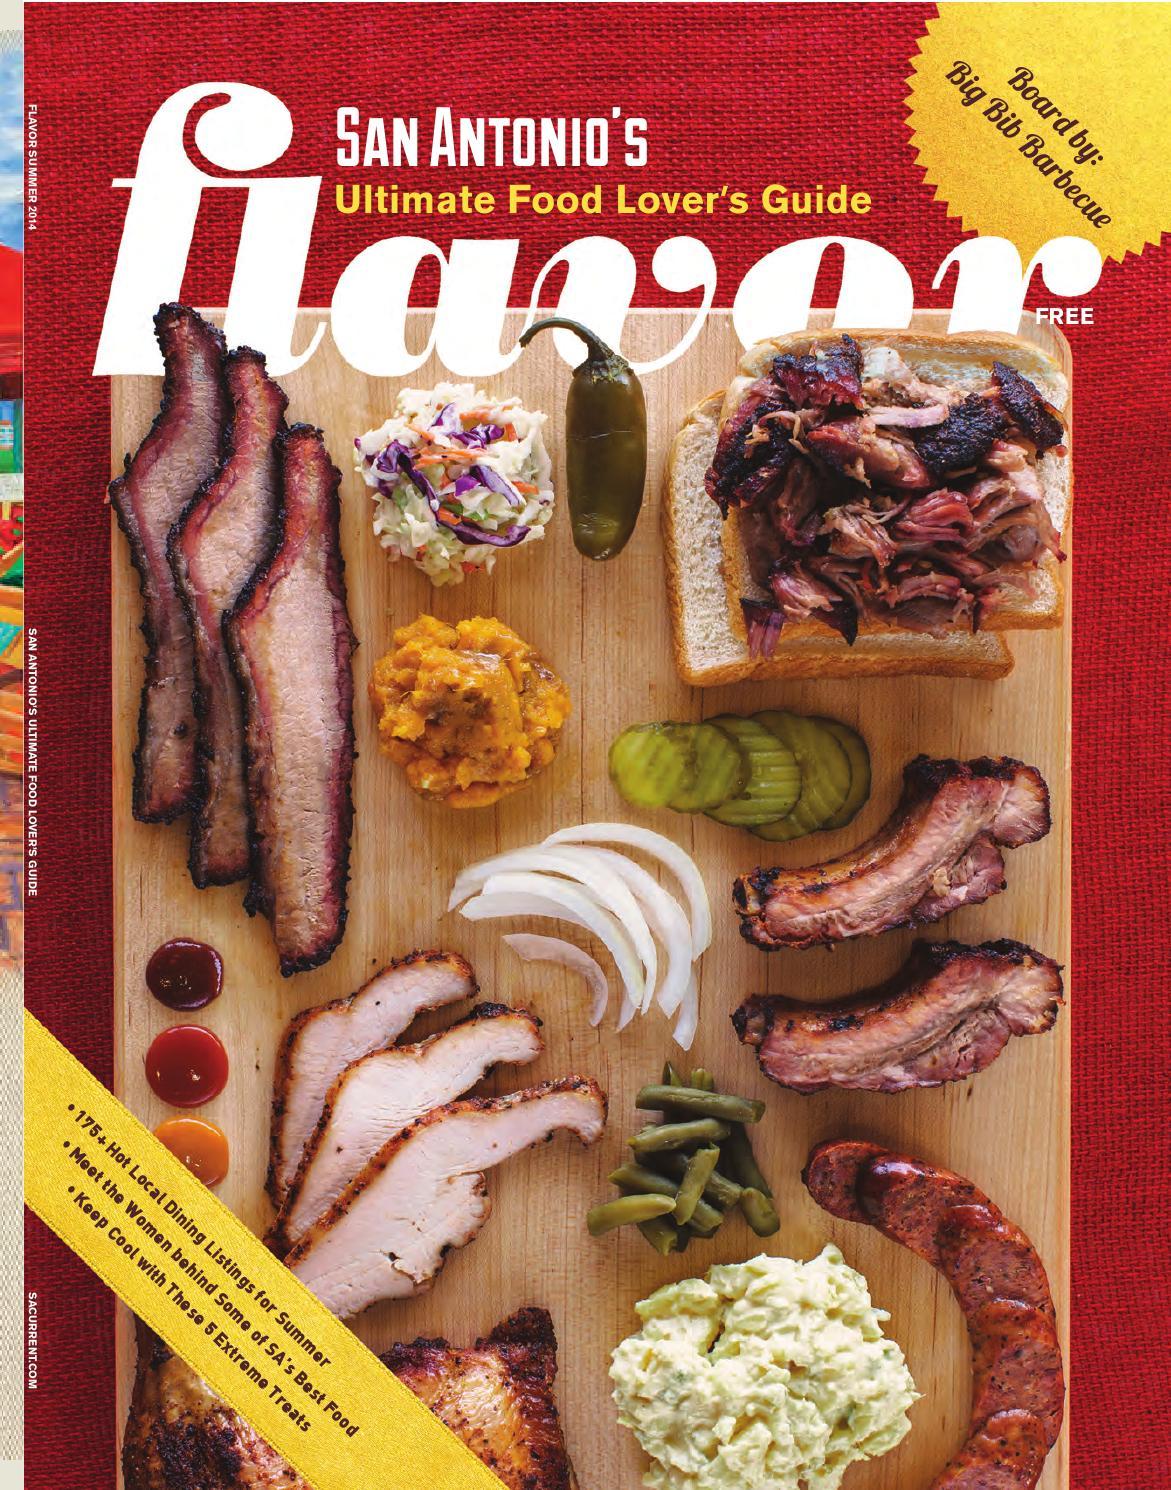 San Antonio Current - Flavor, Summer 2014 by Euclid Media Group - issuu